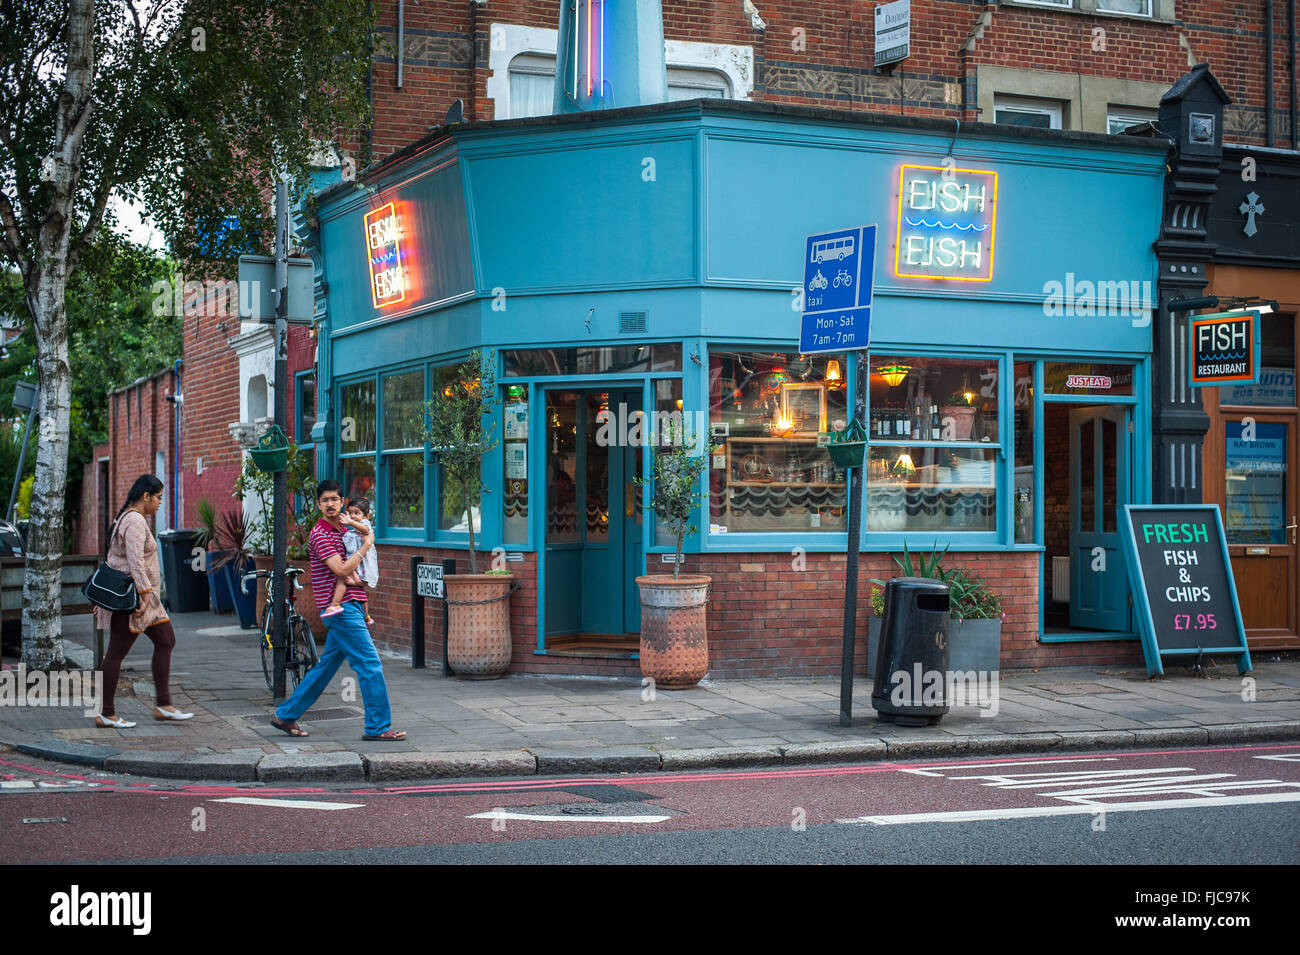 Upmarket Fish & Chips restaurant, Highgate, north London - Stock Image